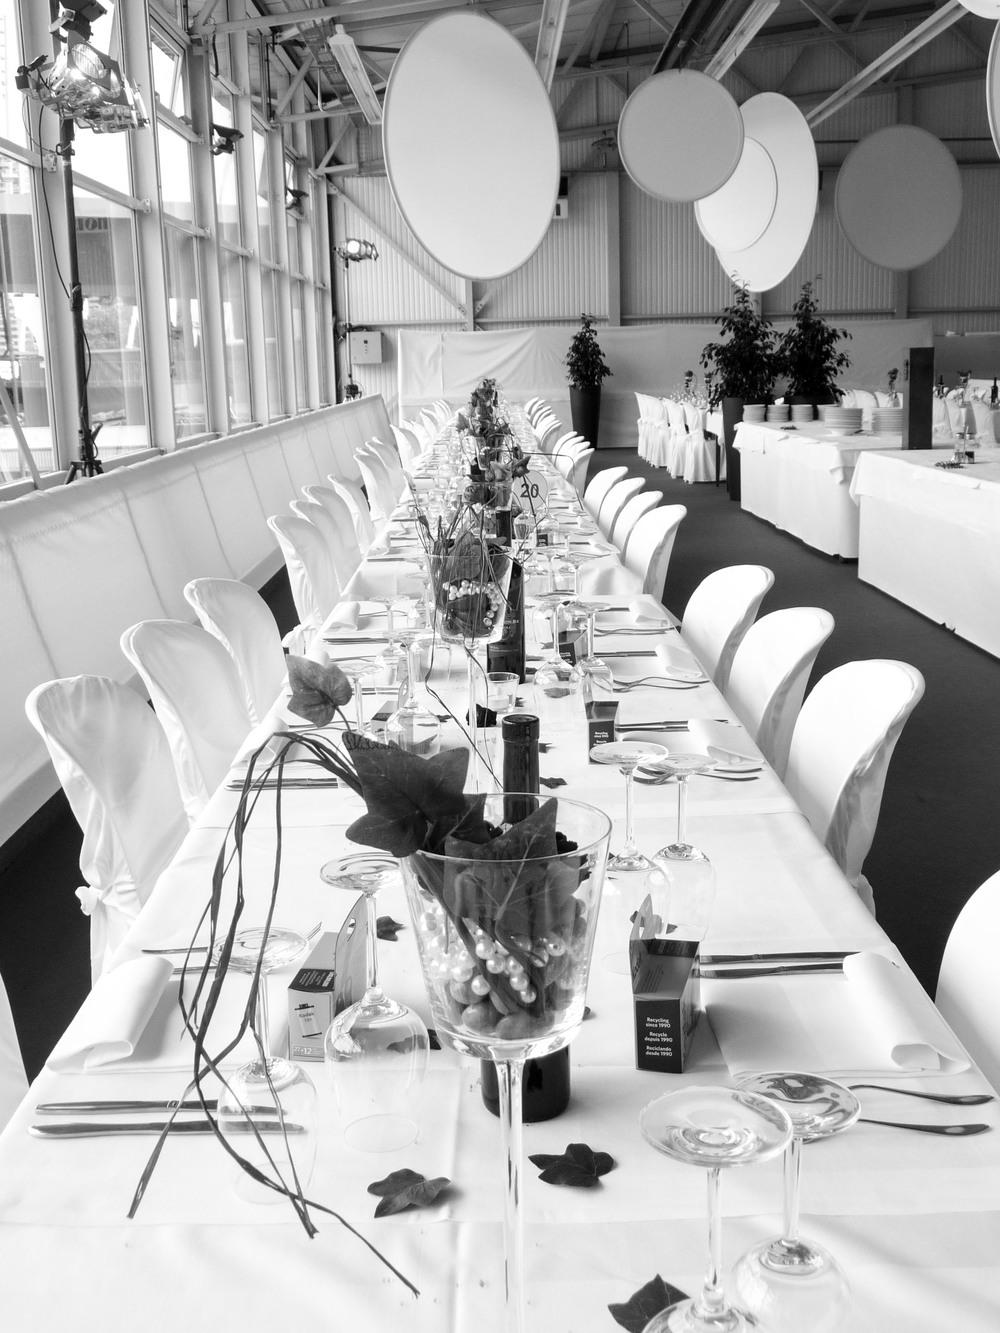 ba_U2 Dinner 2.jpg